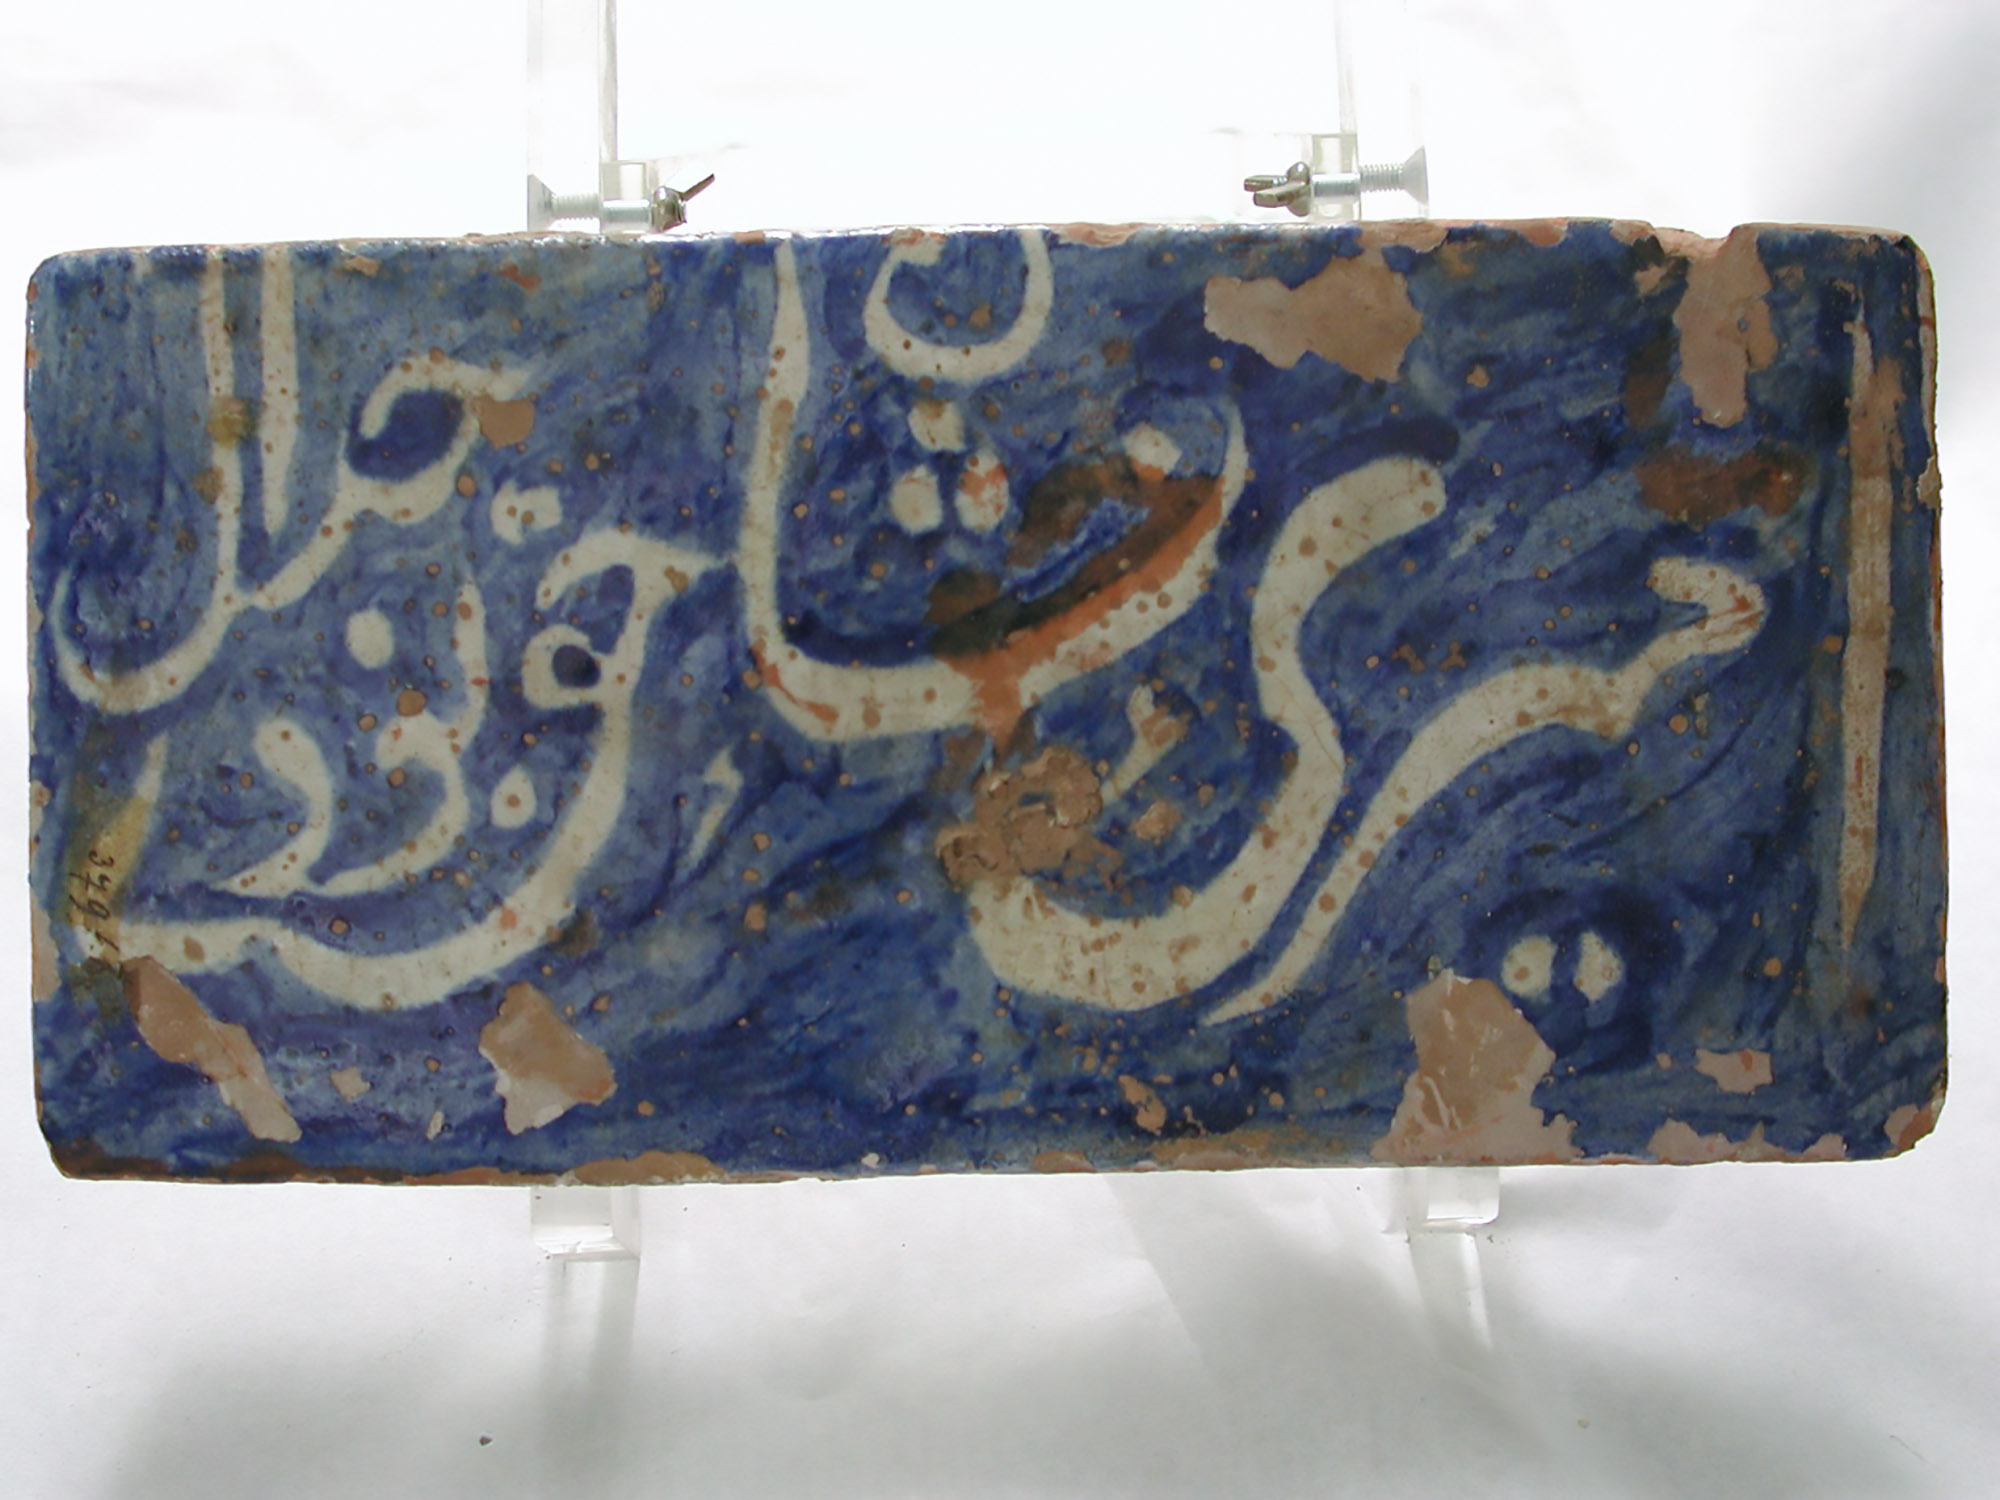 Kachel mit persischer Inschrift